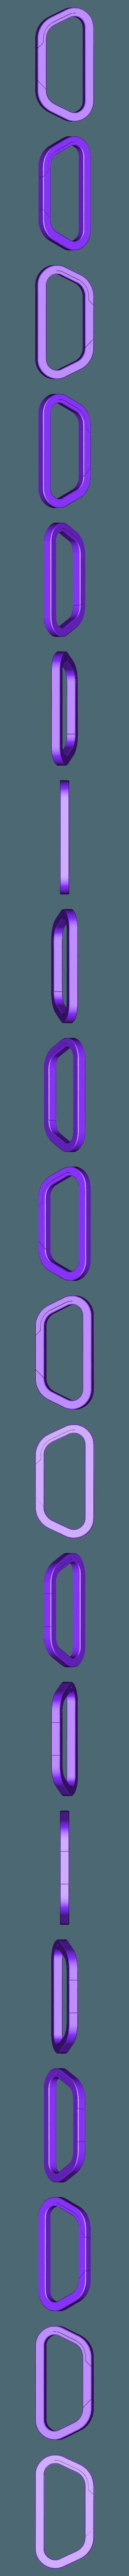 Symmetric_v1-2.STL Download free STL file Symmetric Carabiner • 3D printing template, WalterHsiao